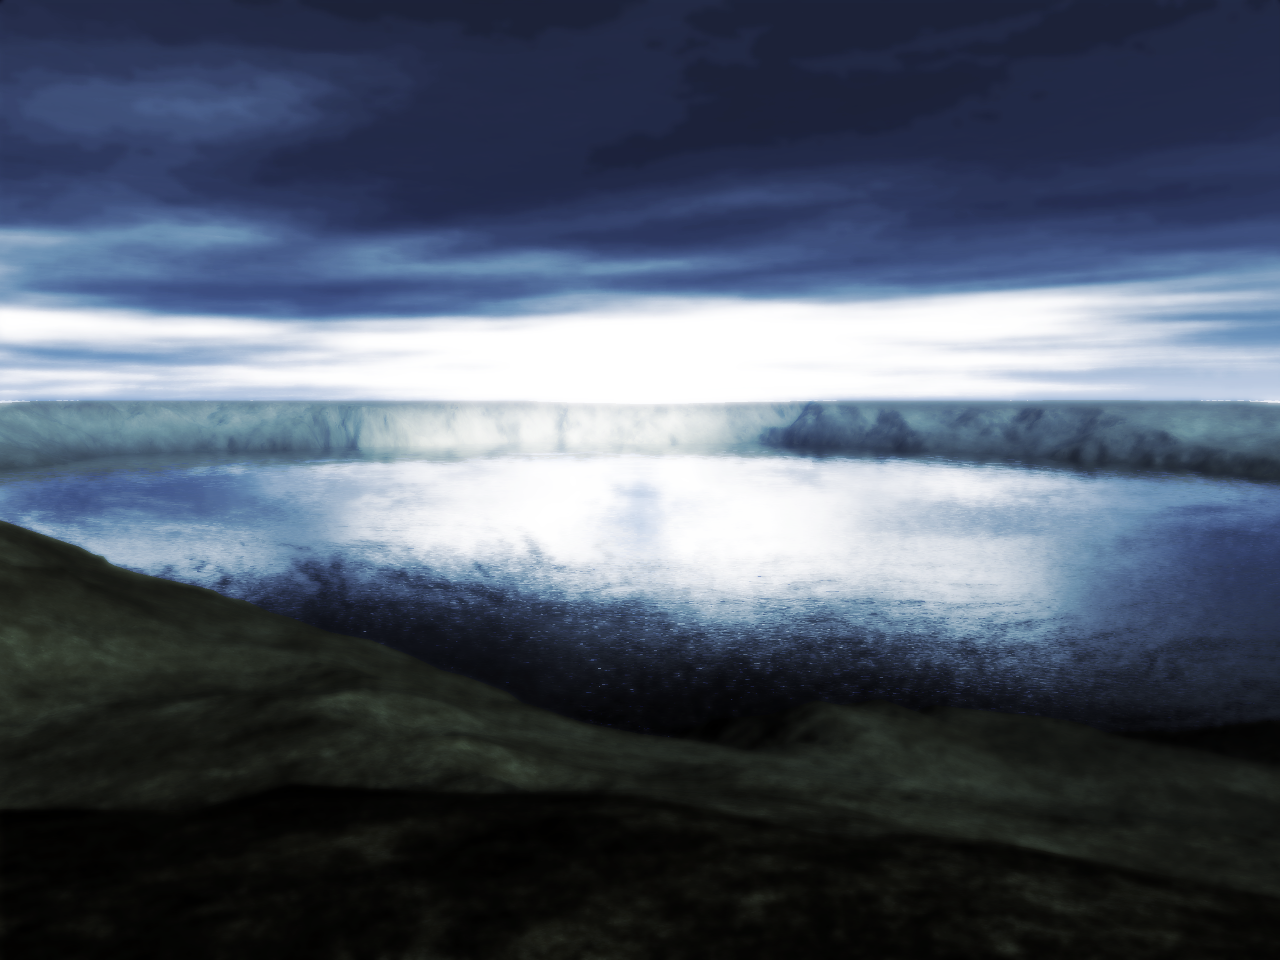 Lake by darkkingddd